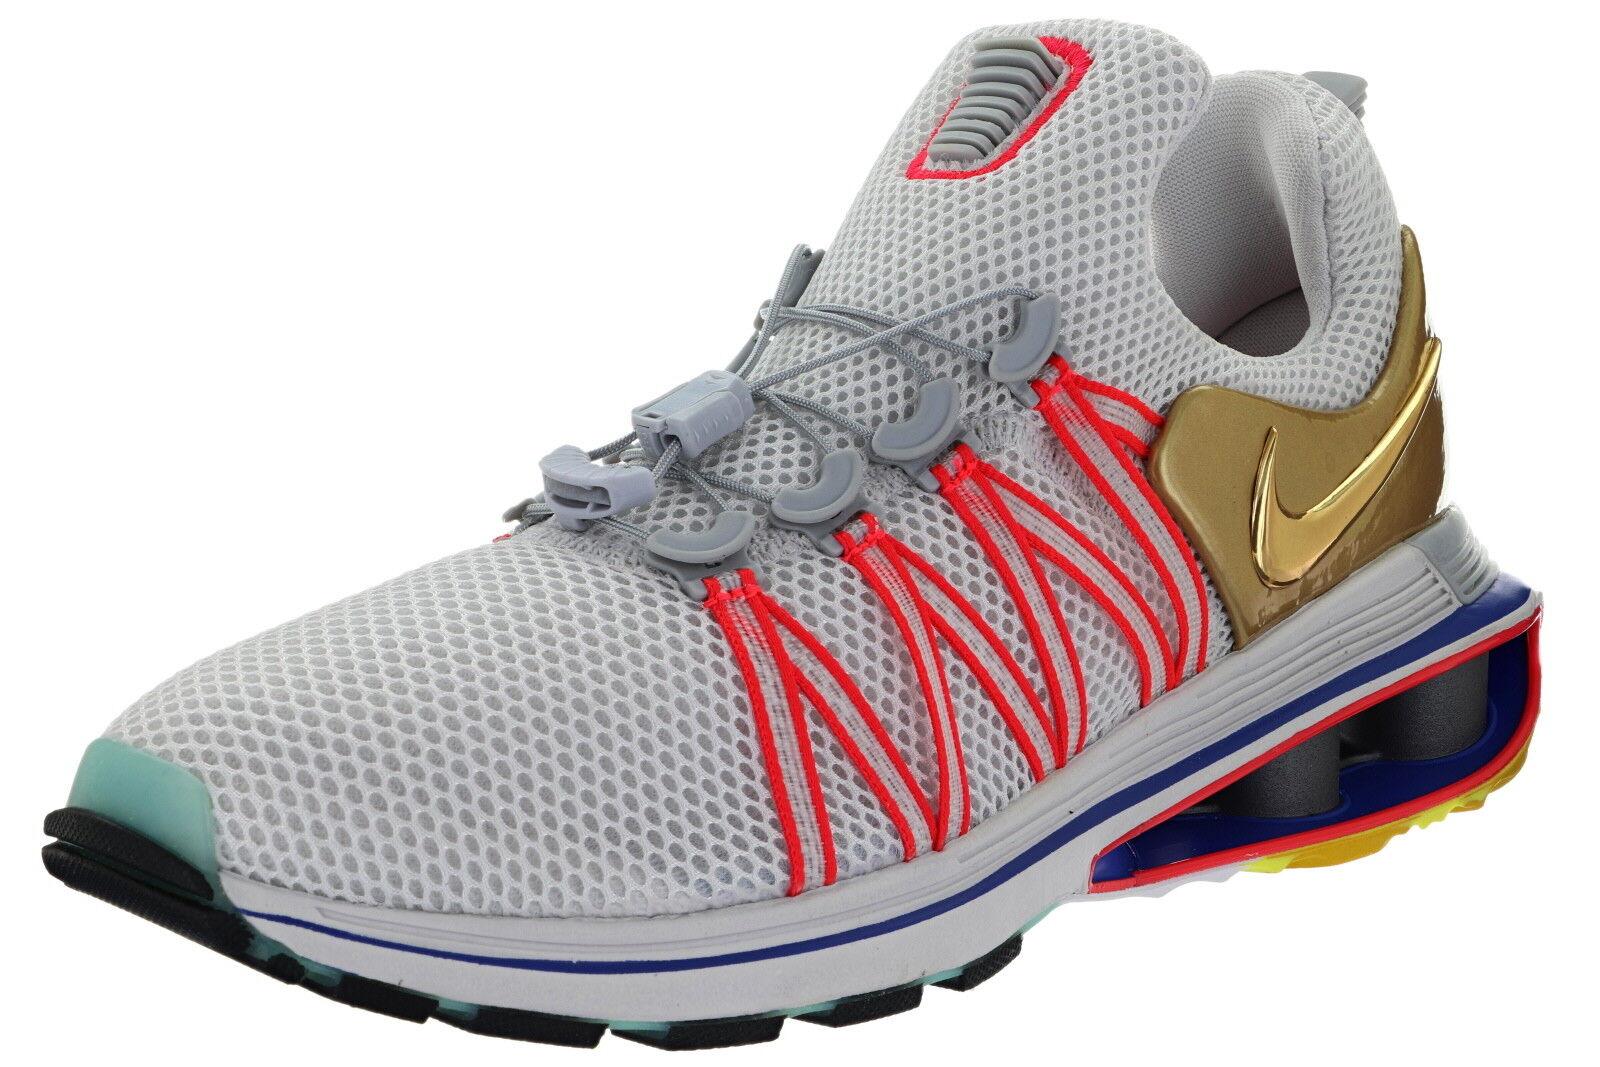 Nike Shox Gravity Men's Medium Width Athletic Running shoes AQ8553-009